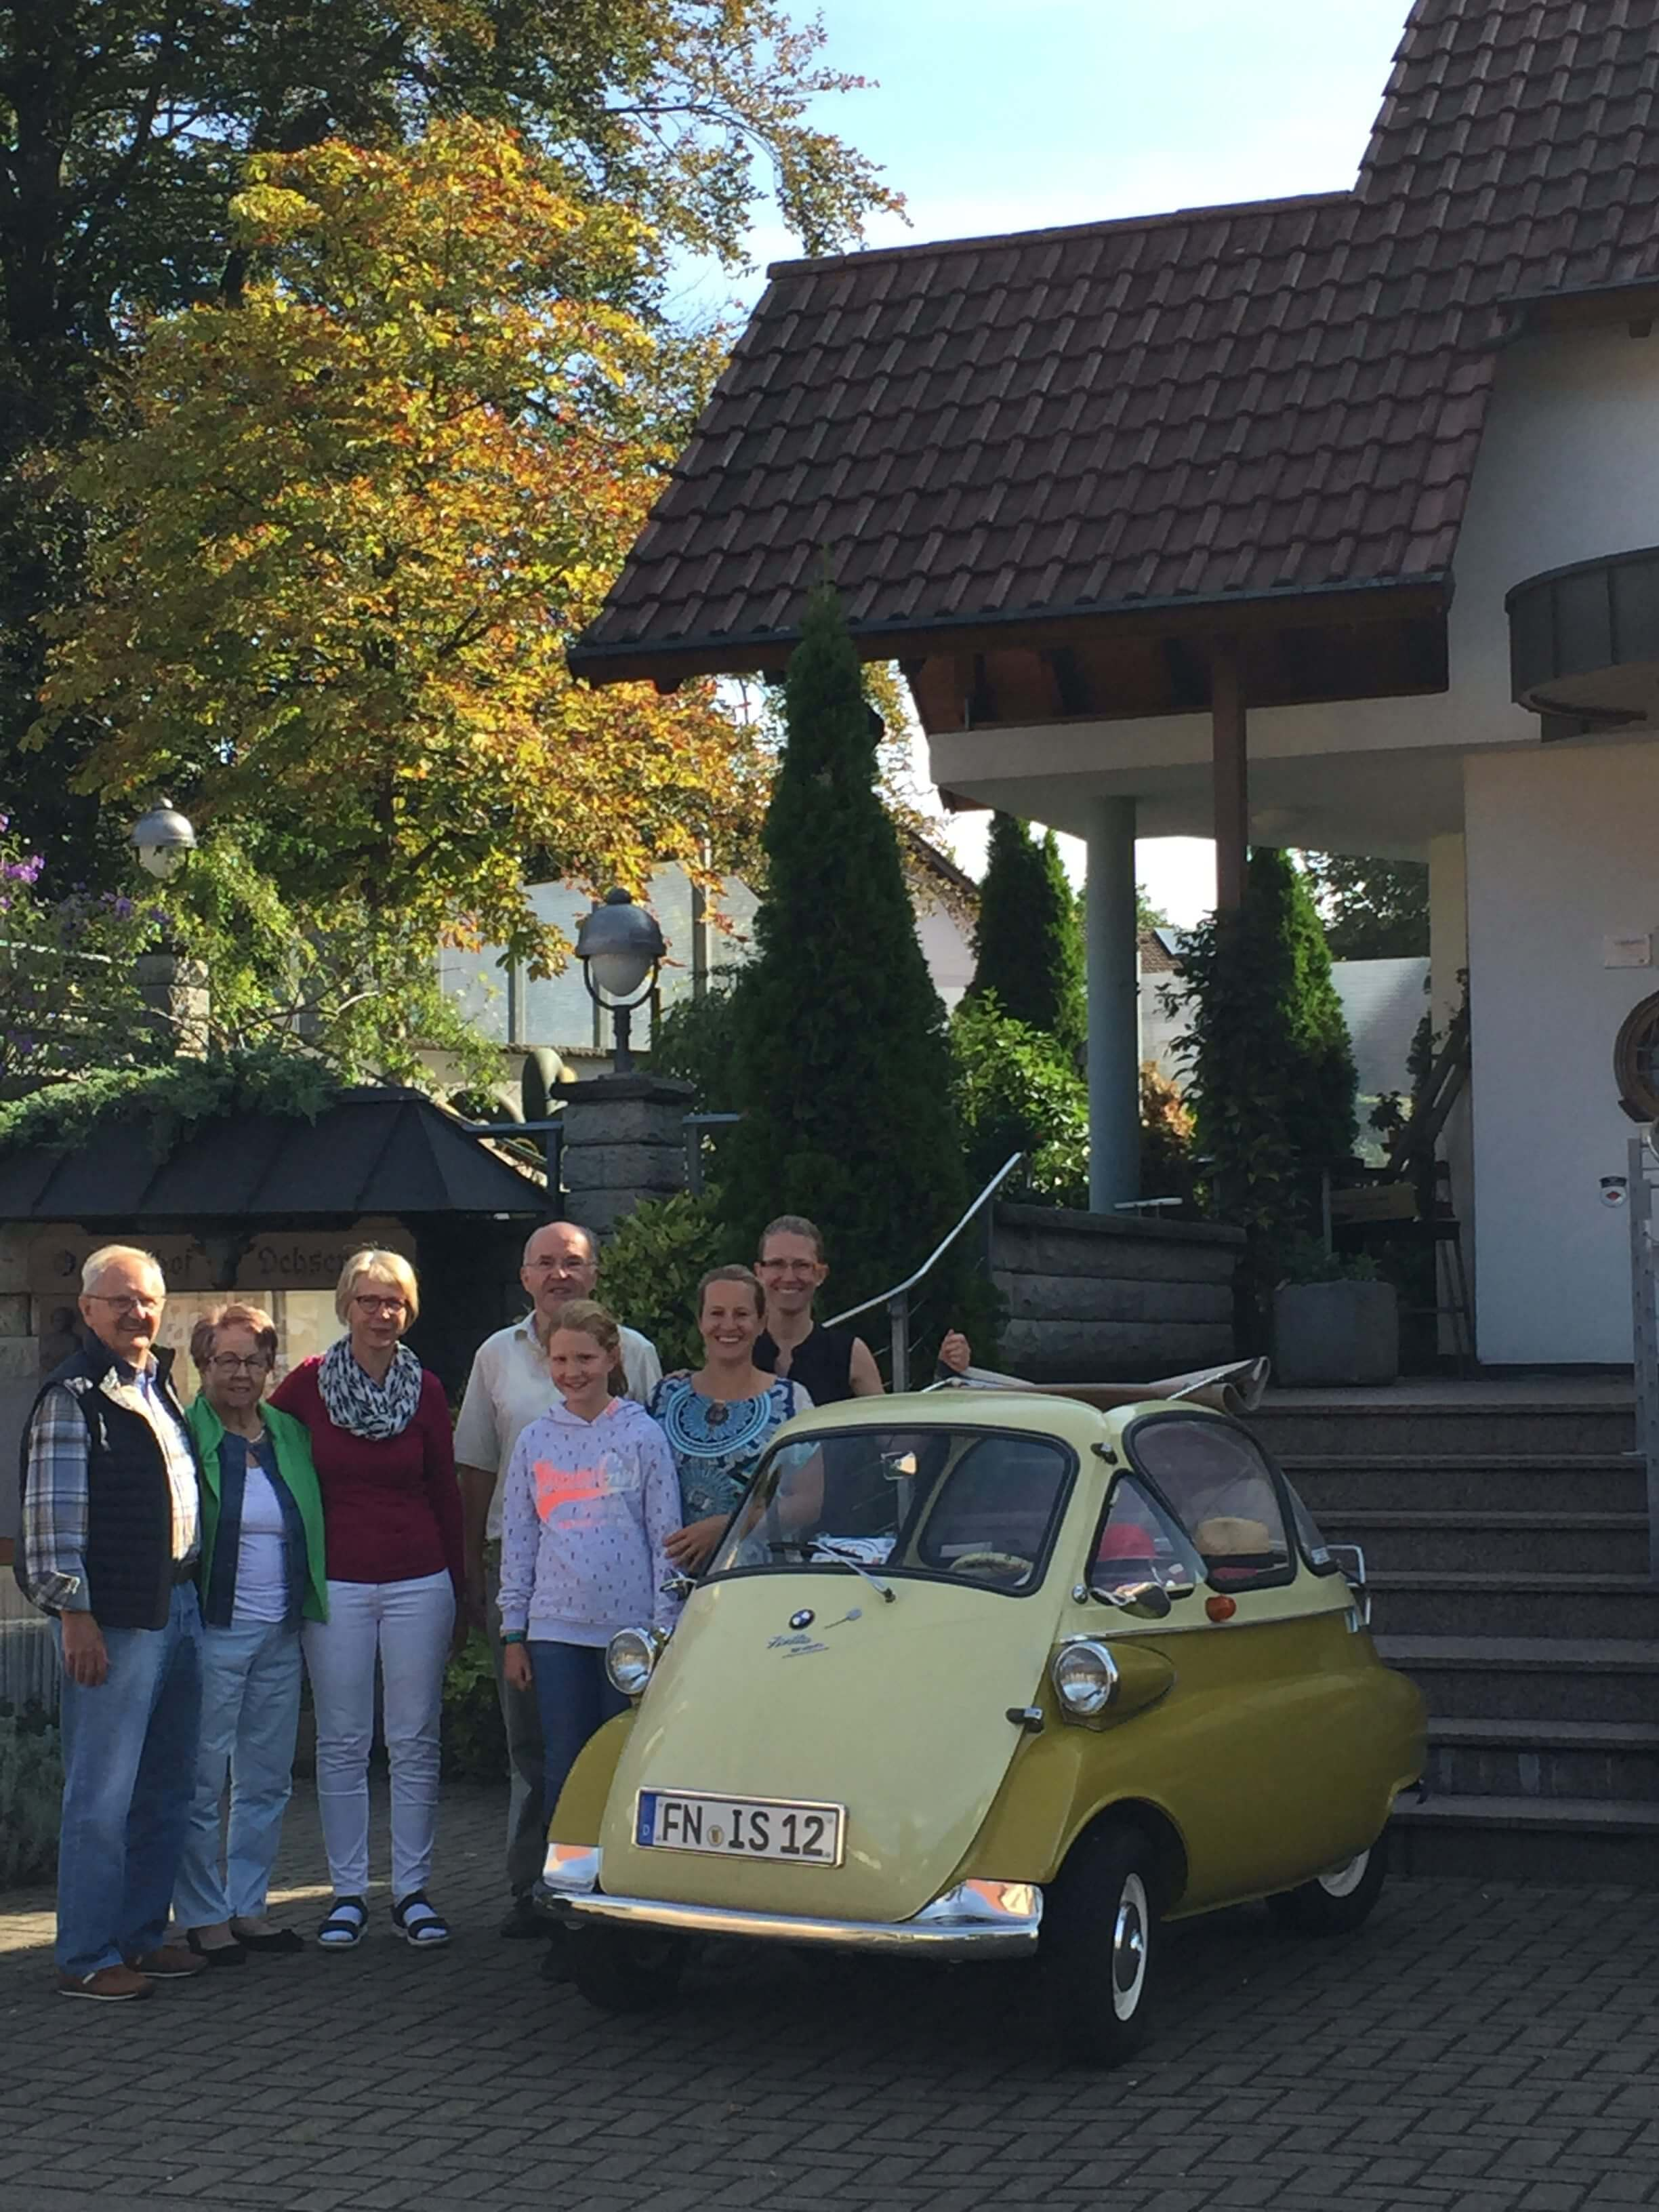 gruppenbild-familie-schwarzwald-hotel-pension schmieders ochsen